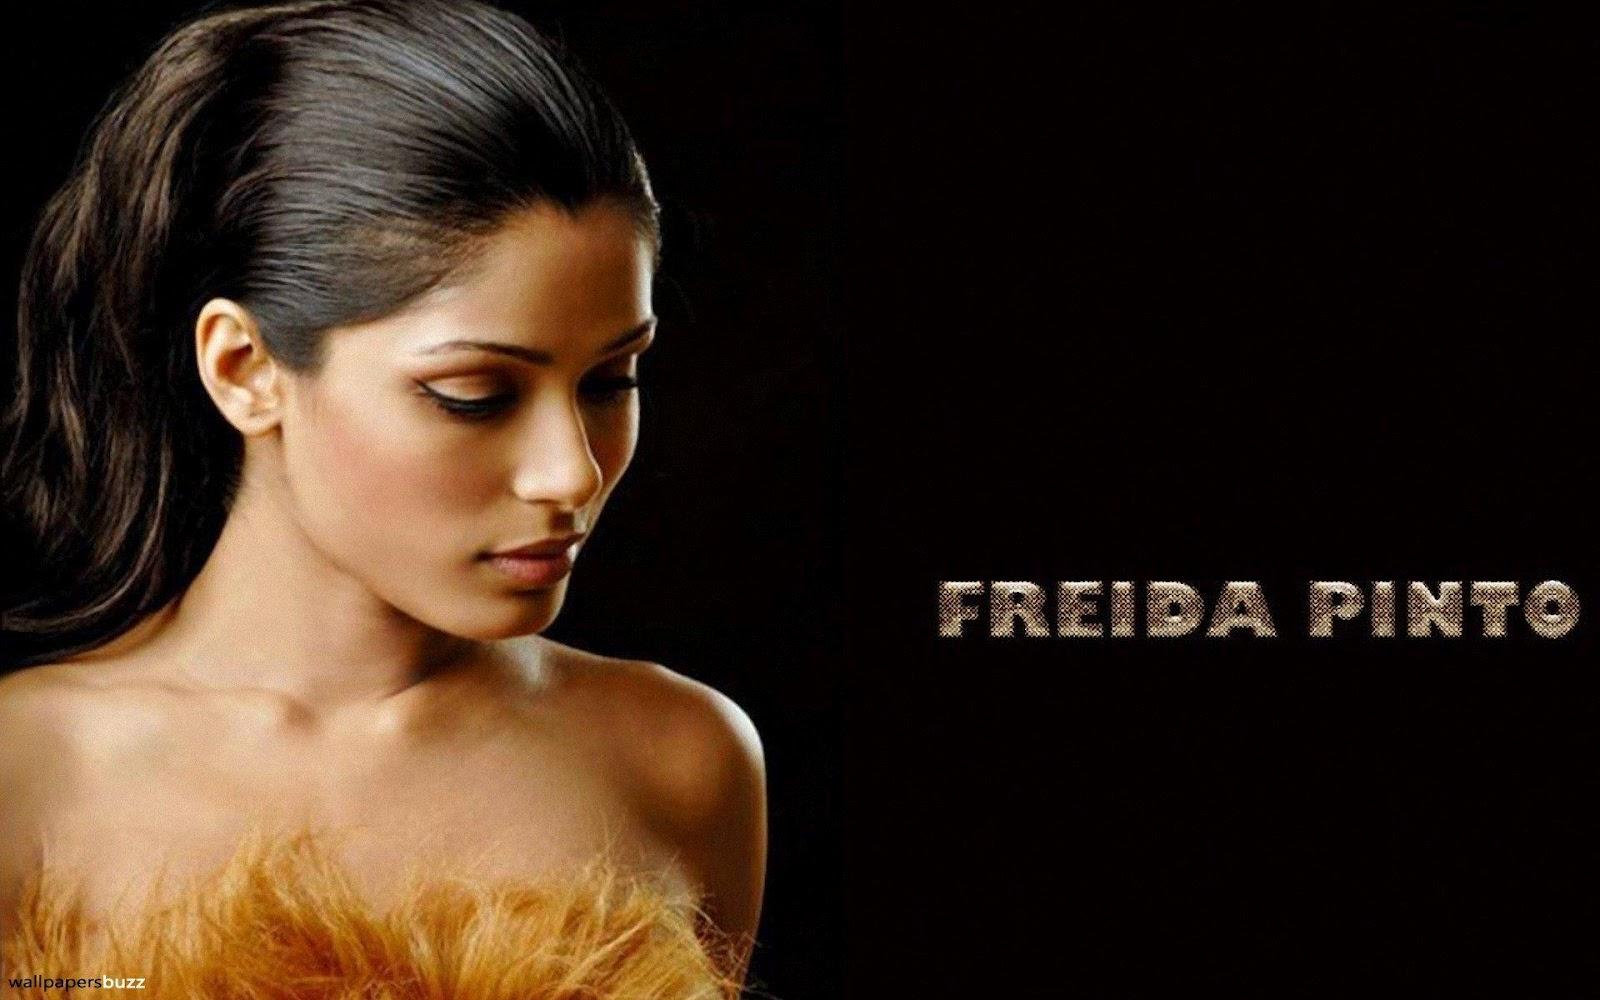 http://4.bp.blogspot.com/-v-WK49DkWt4/T8450EpSnwI/AAAAAAAABFg/vq1R4l3vV80/s1600/Freida_Pinto_Photo_in_HD.jpg